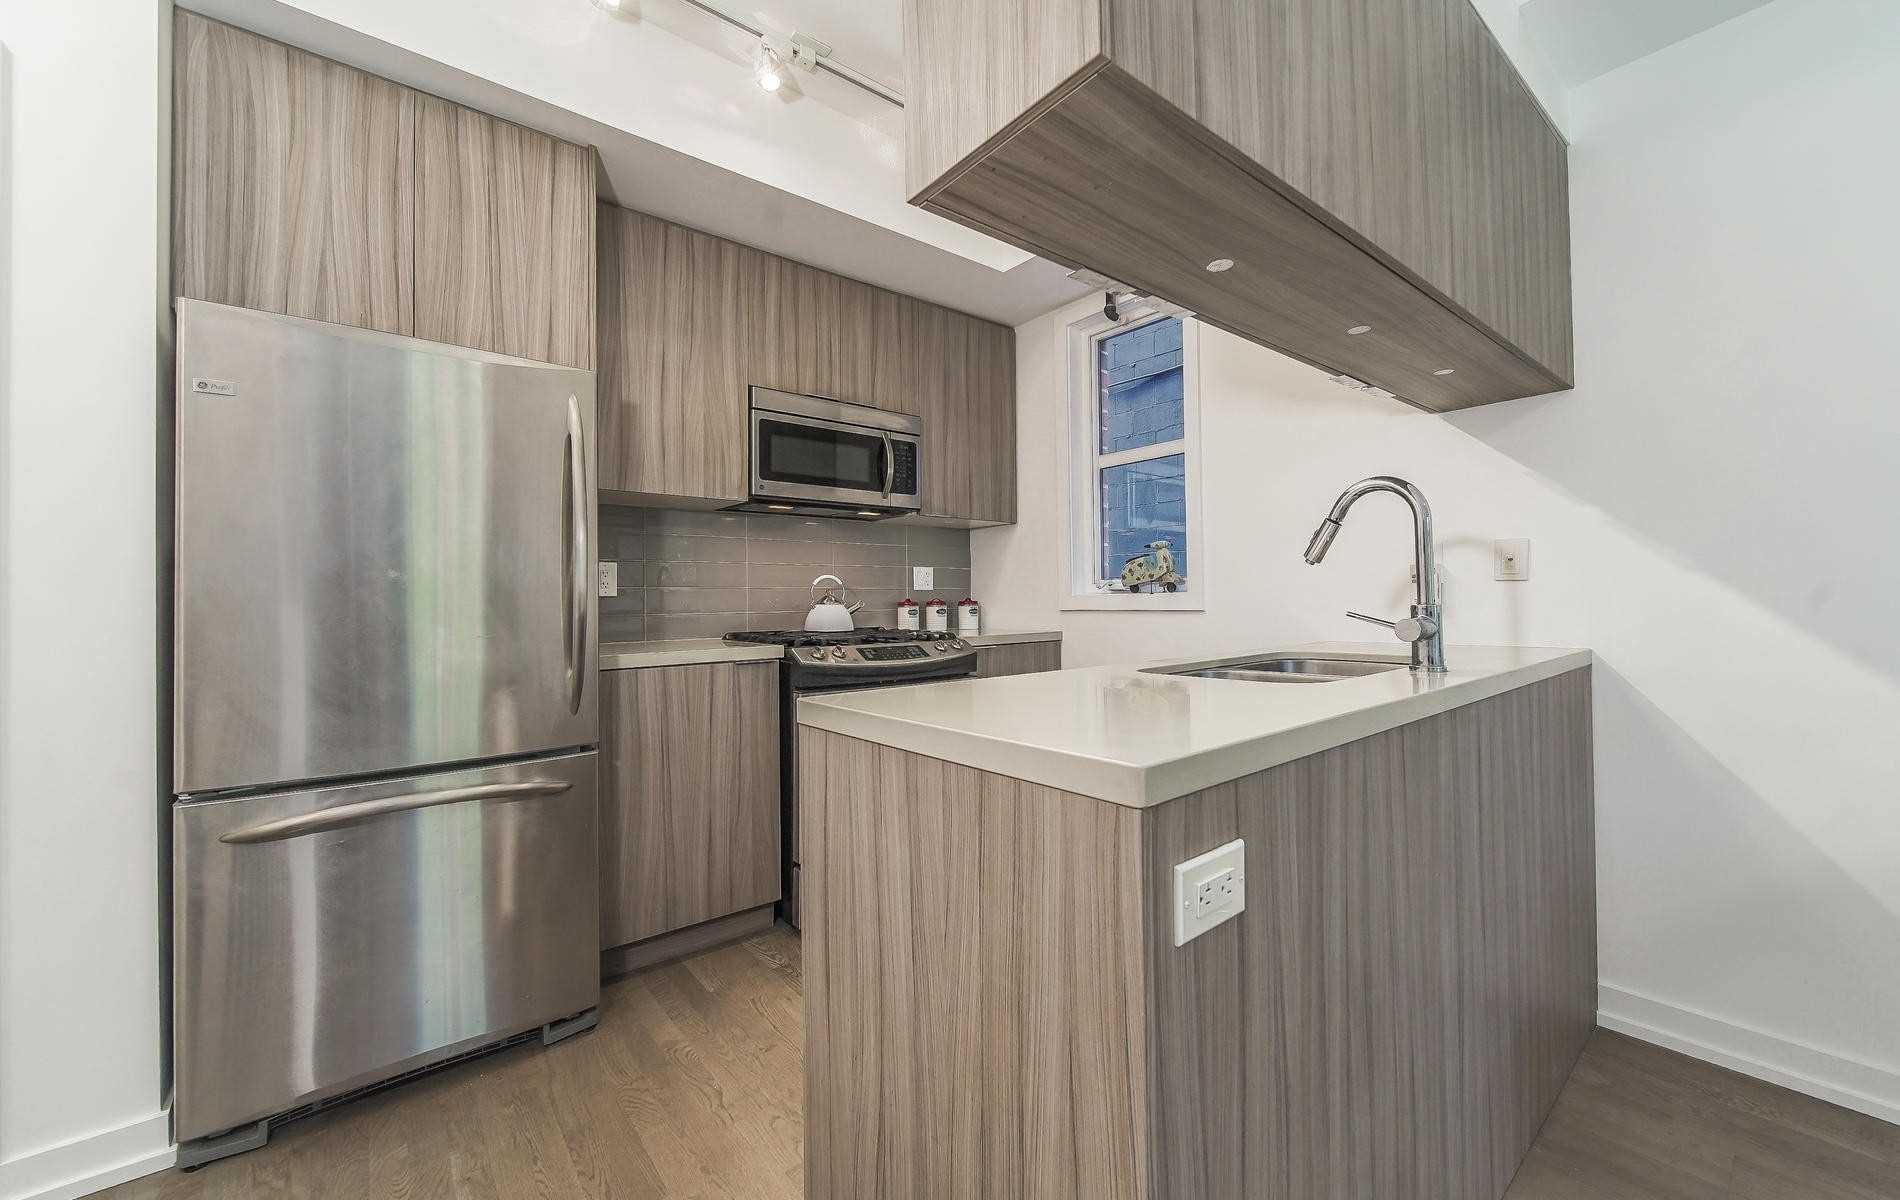 Photo 4: Photos: Th 11 150 Broadview Avenue in Toronto: South Riverdale Condo for sale (Toronto E01)  : MLS®# E4519038